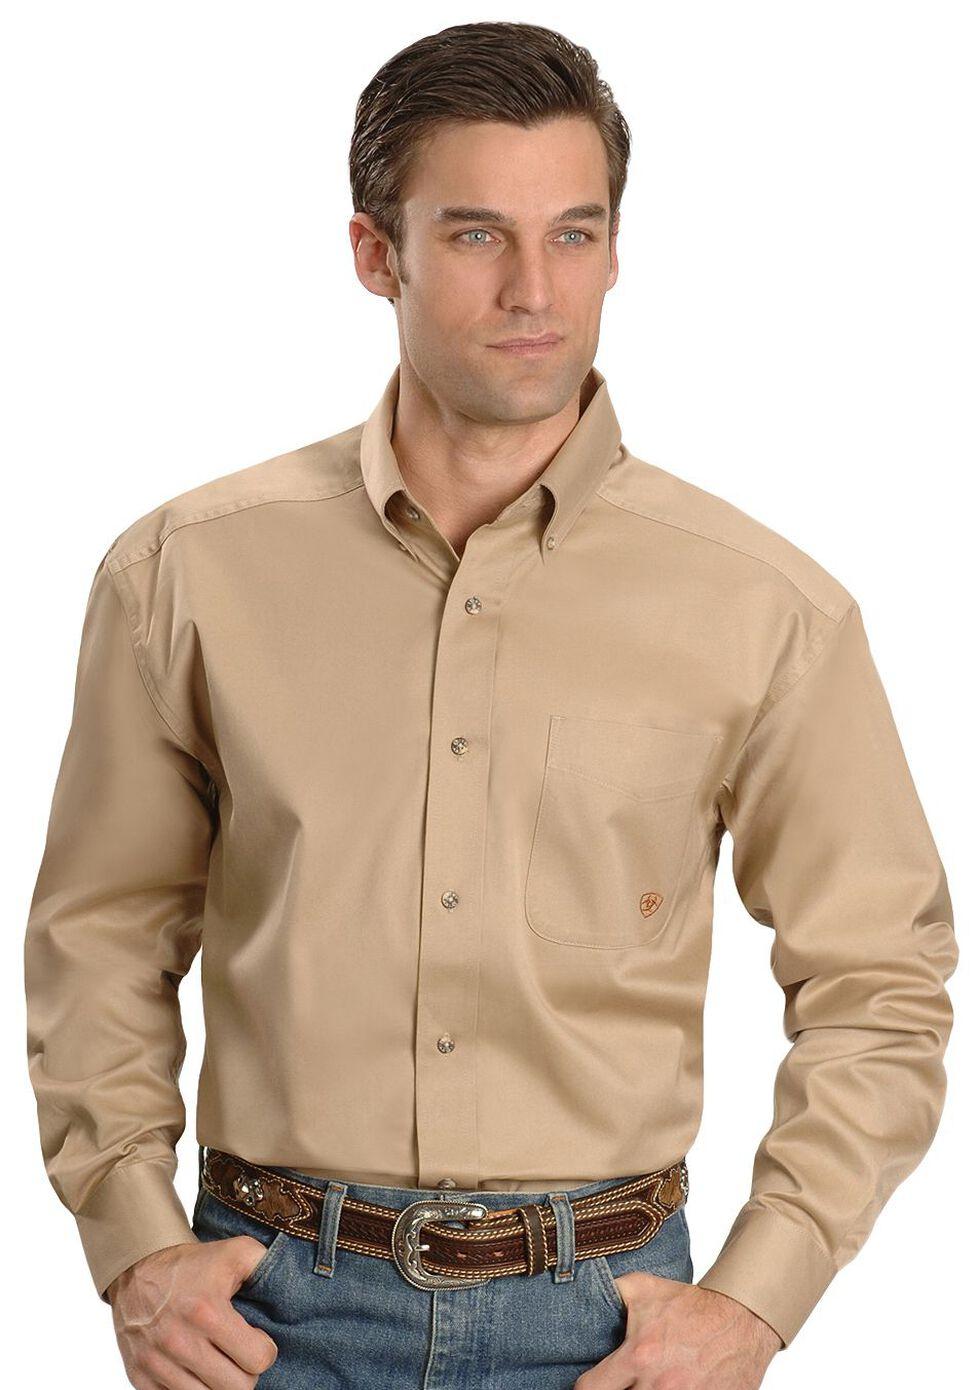 Ariat Khaki Twill Cowboy Shirt, Khaki, hi-res